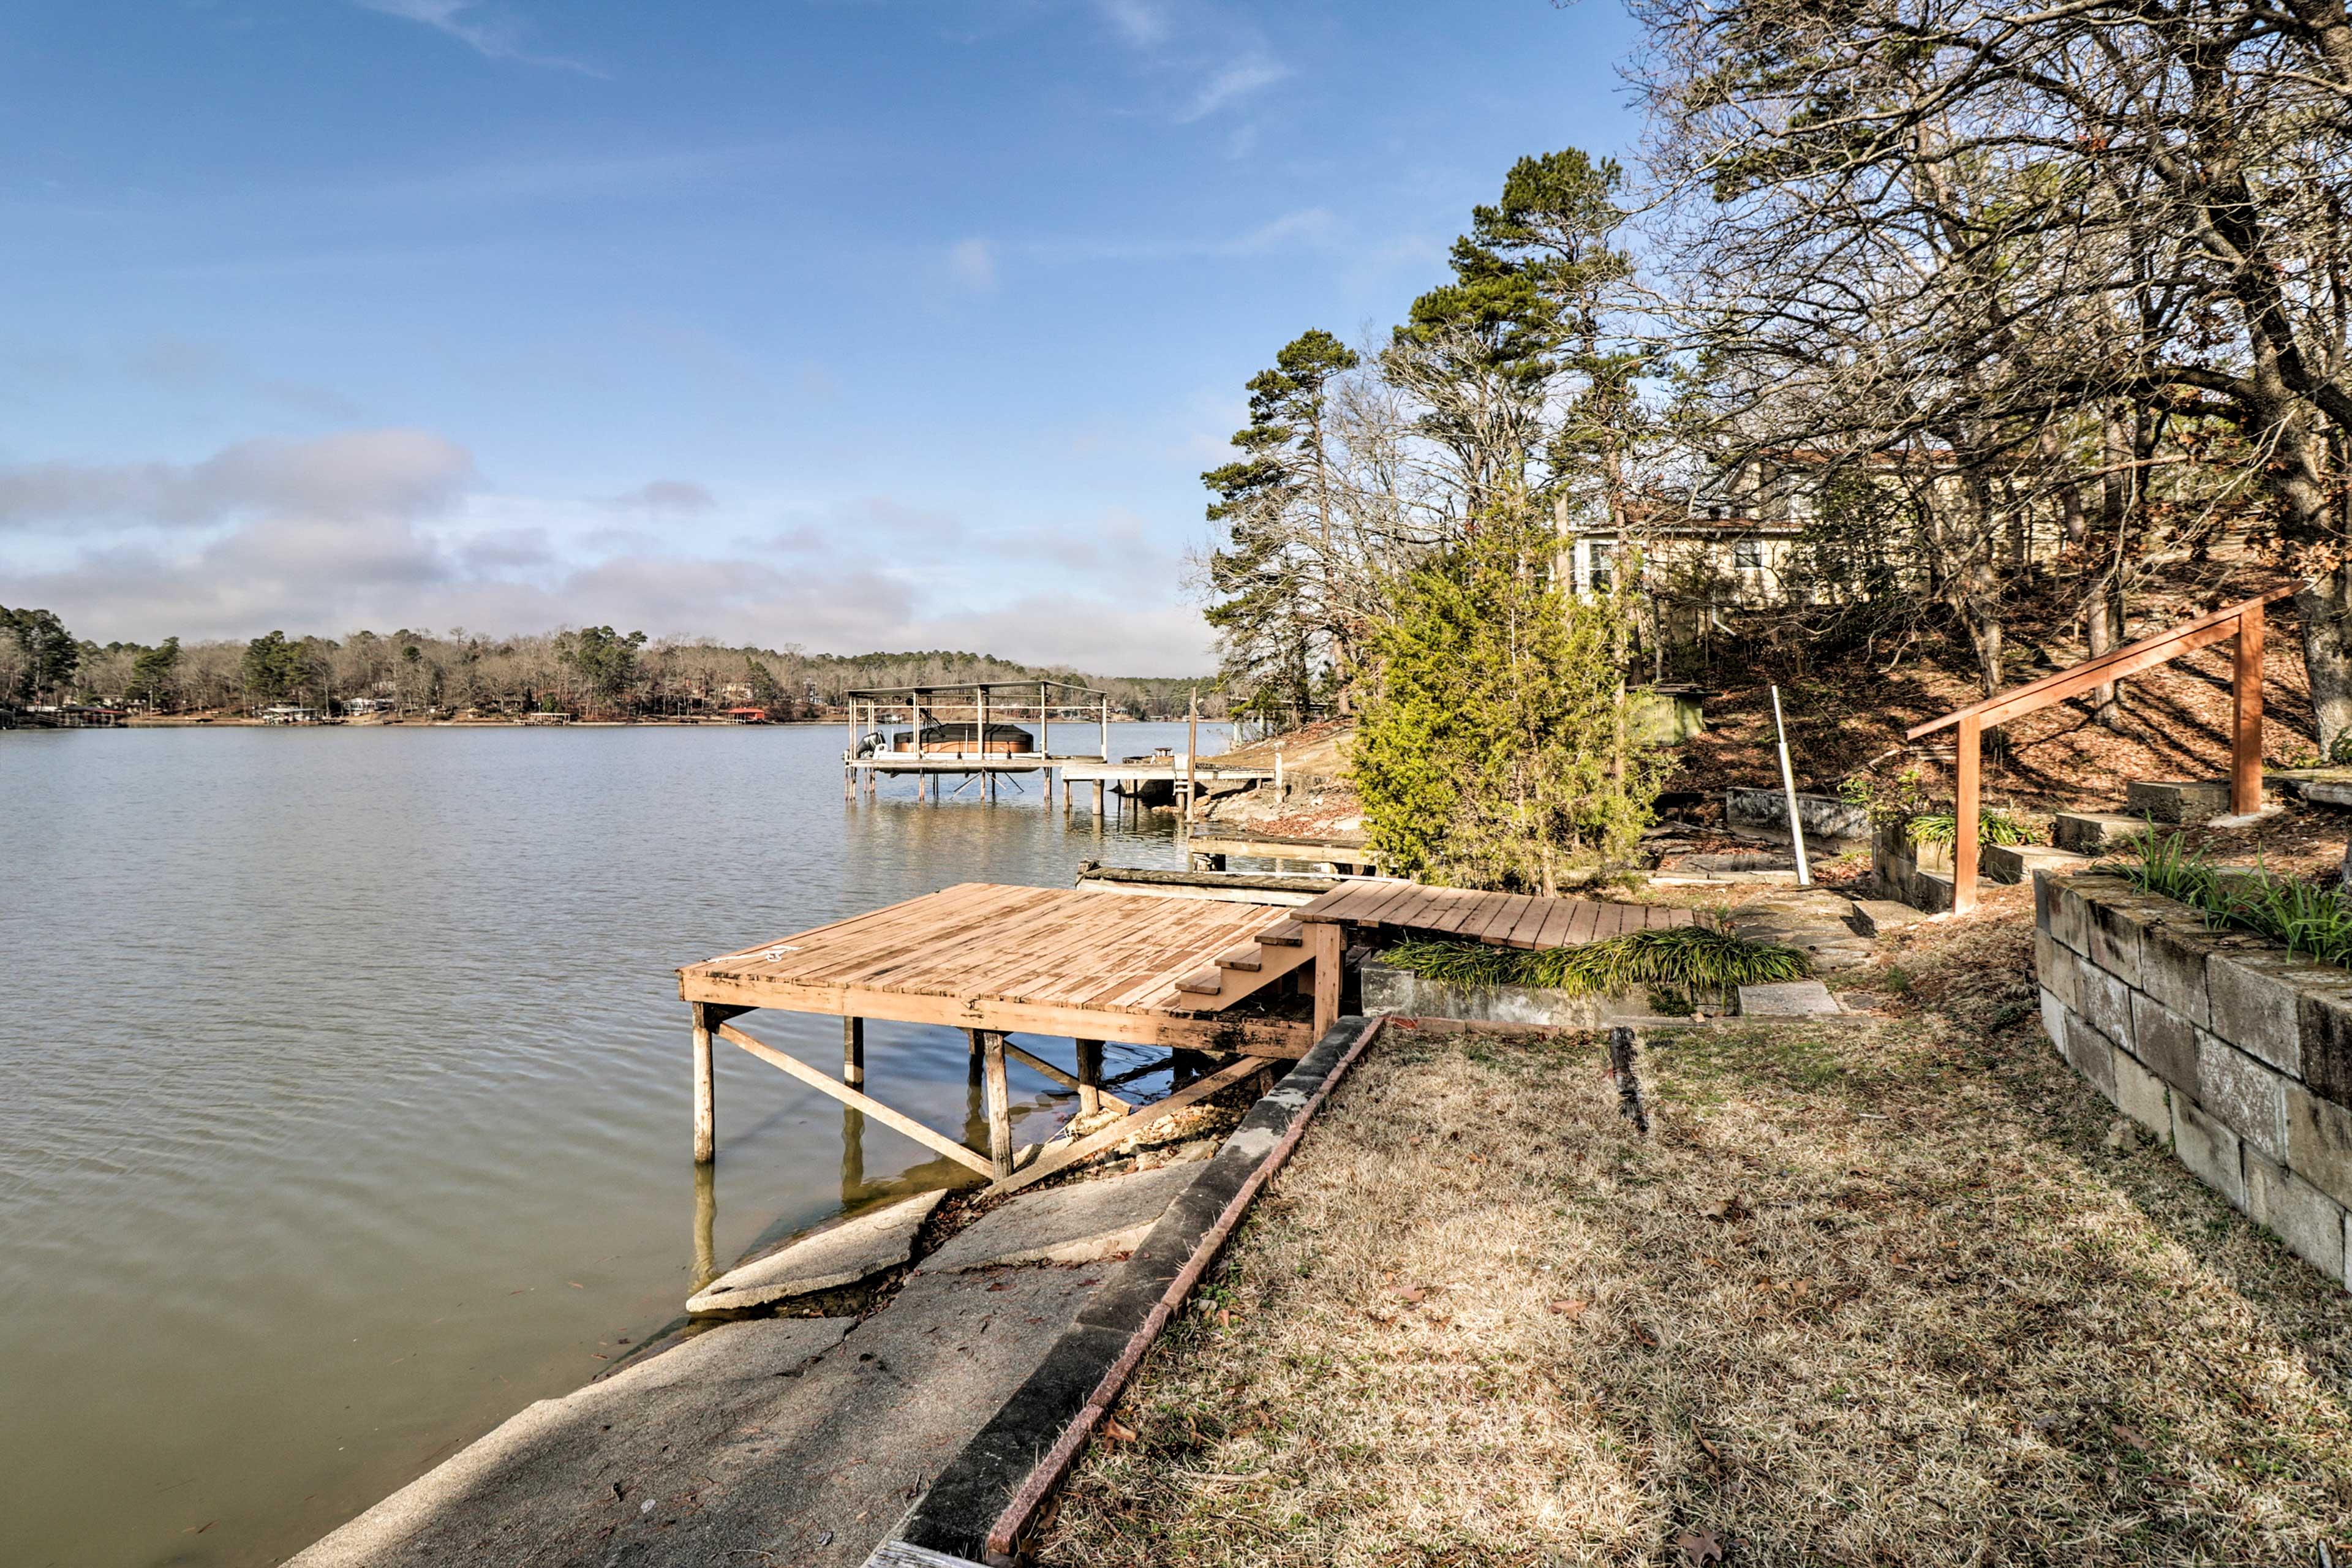 Take nature-loving hippies to the Garvan Woodland Gardens 16 miles away.